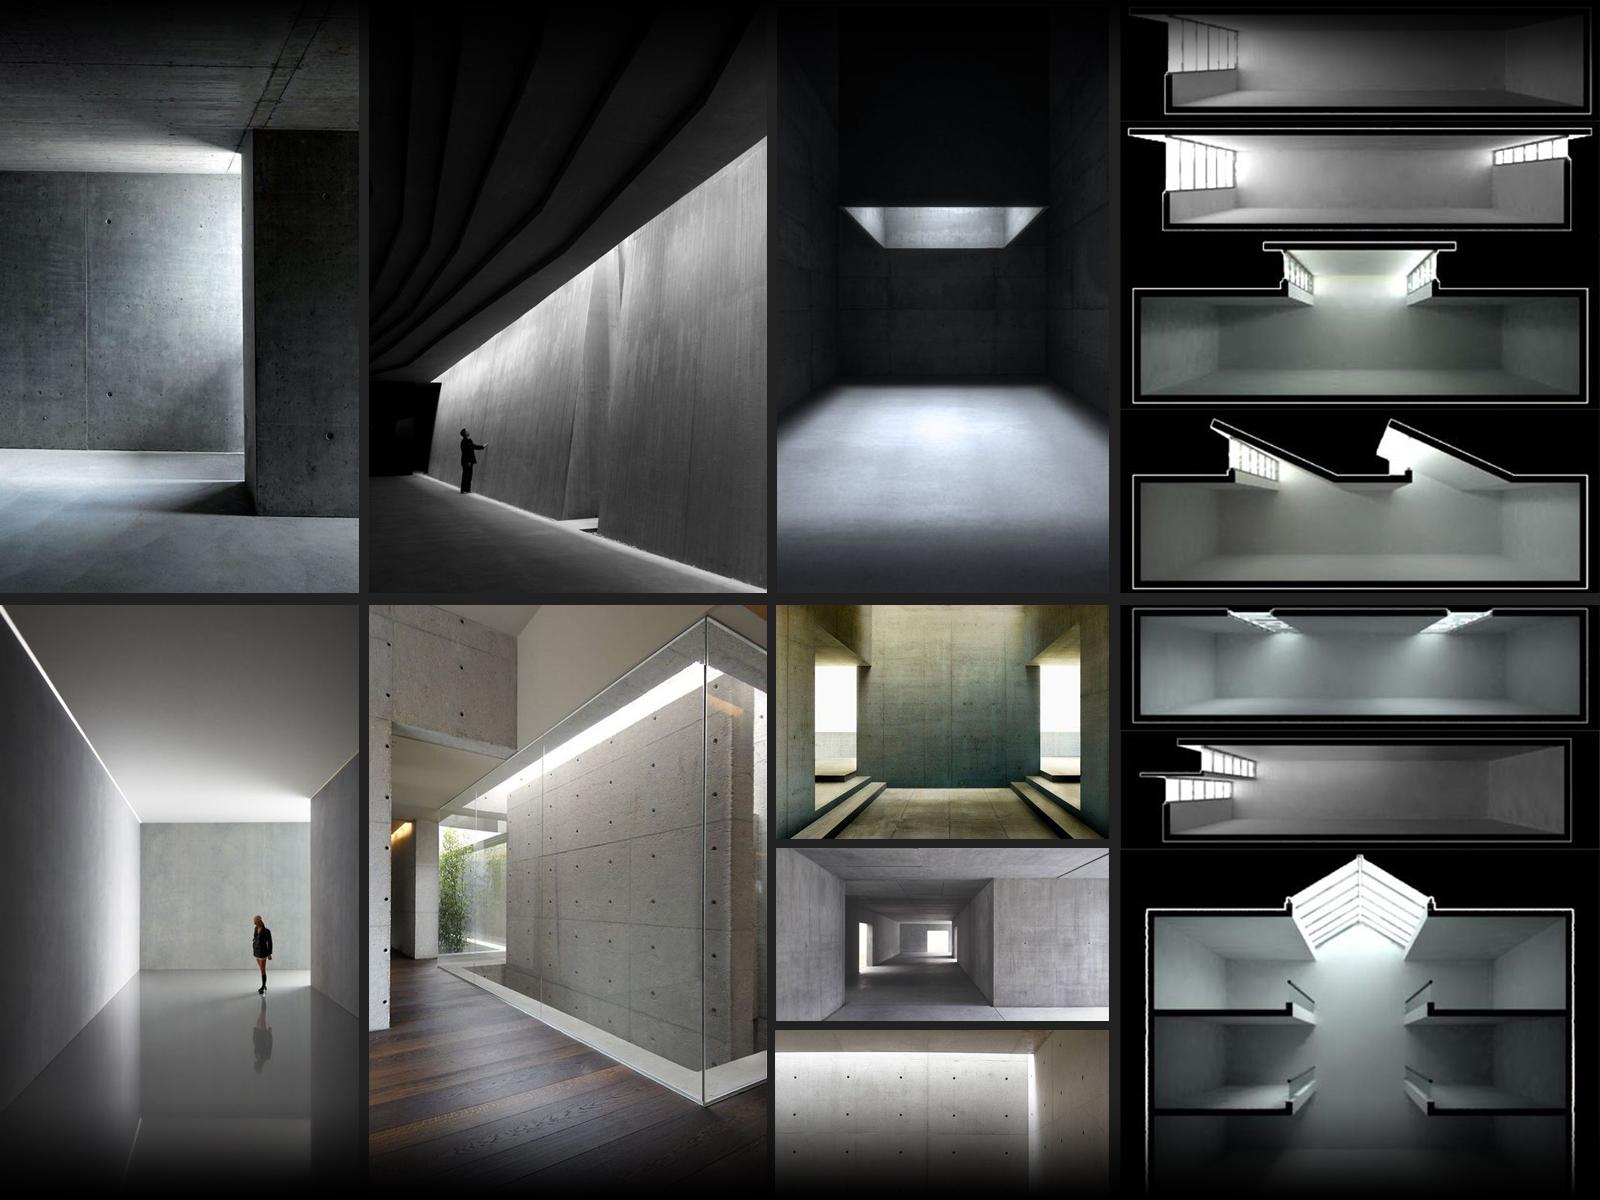 mad-gfx-warehouse-v1-7.jpg